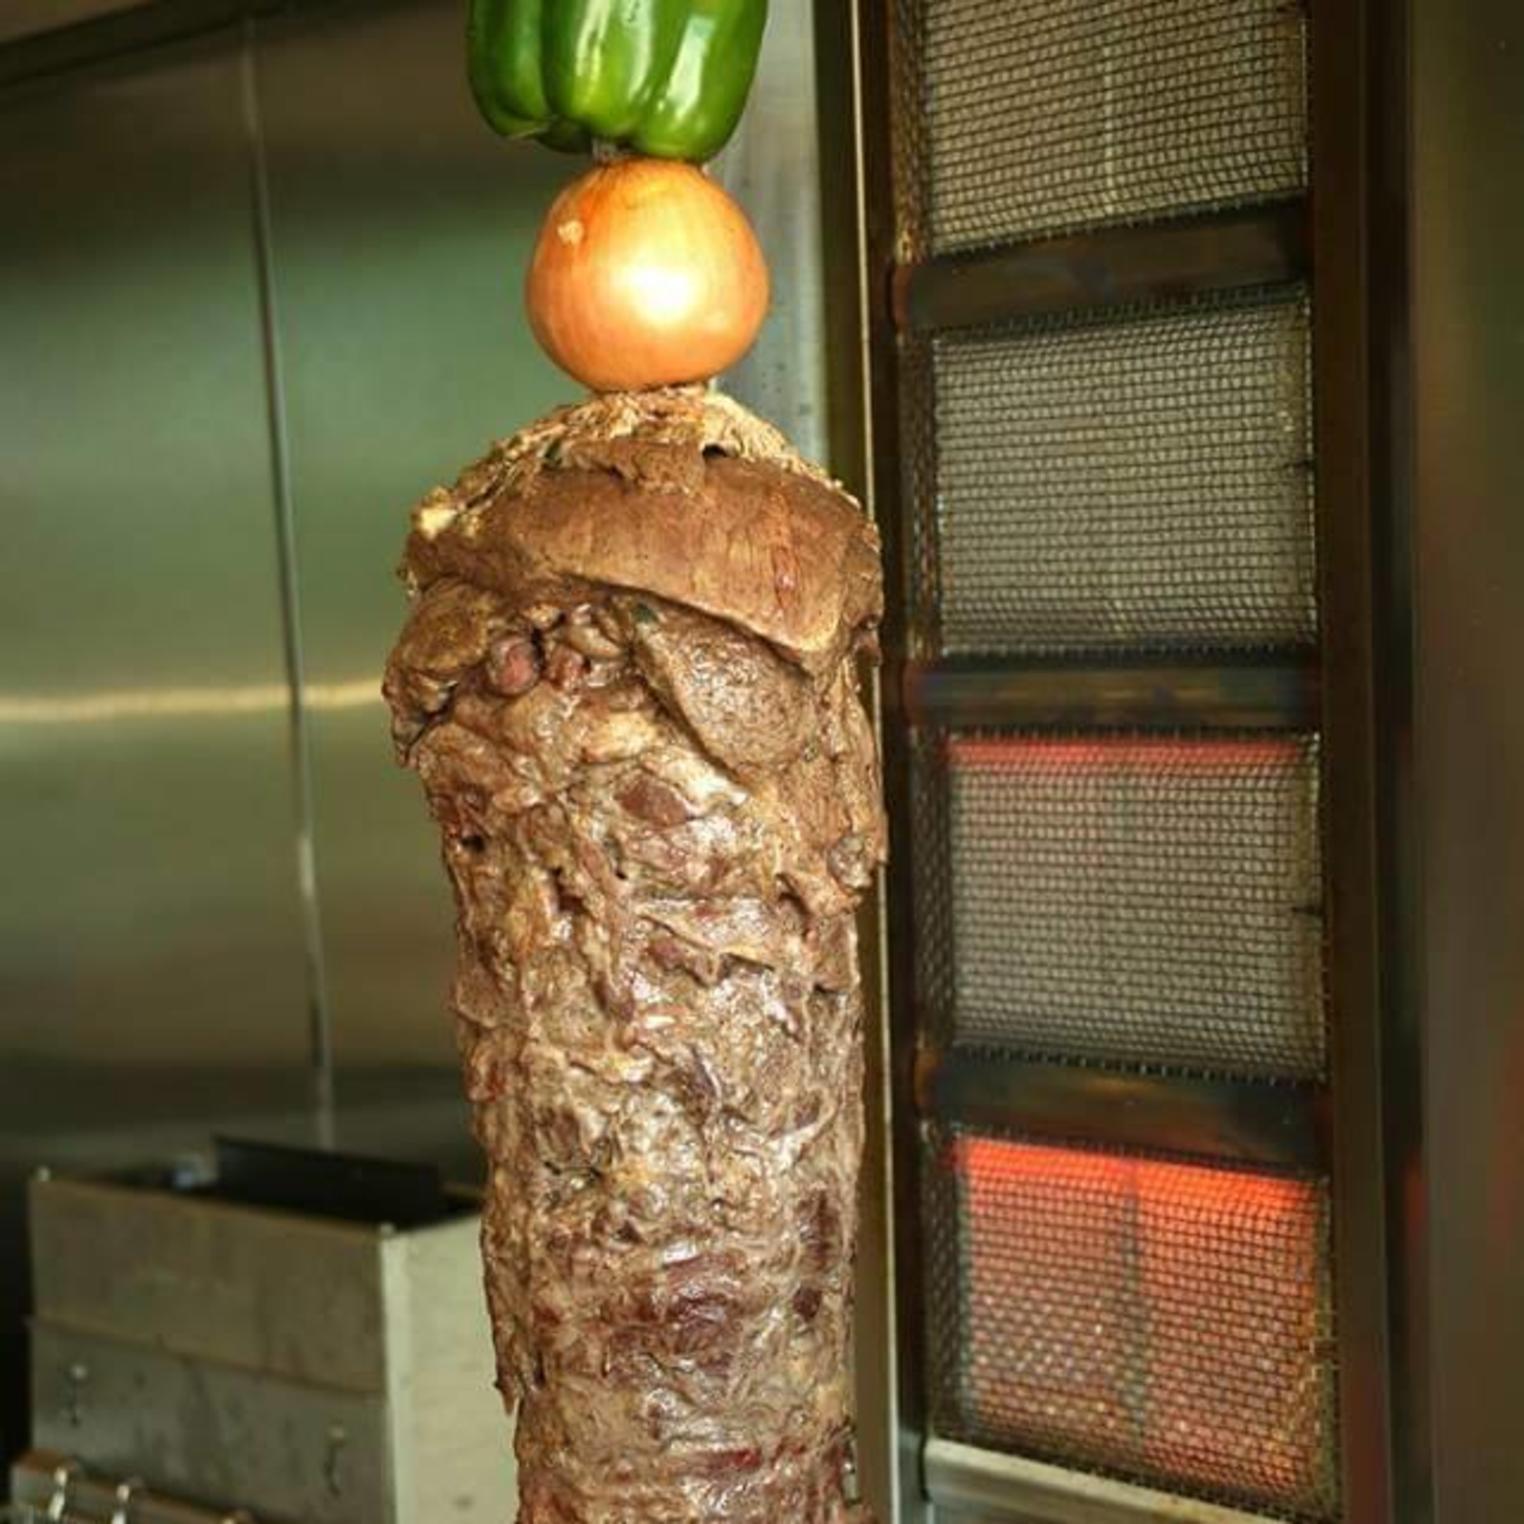 QuickChick Shawarma